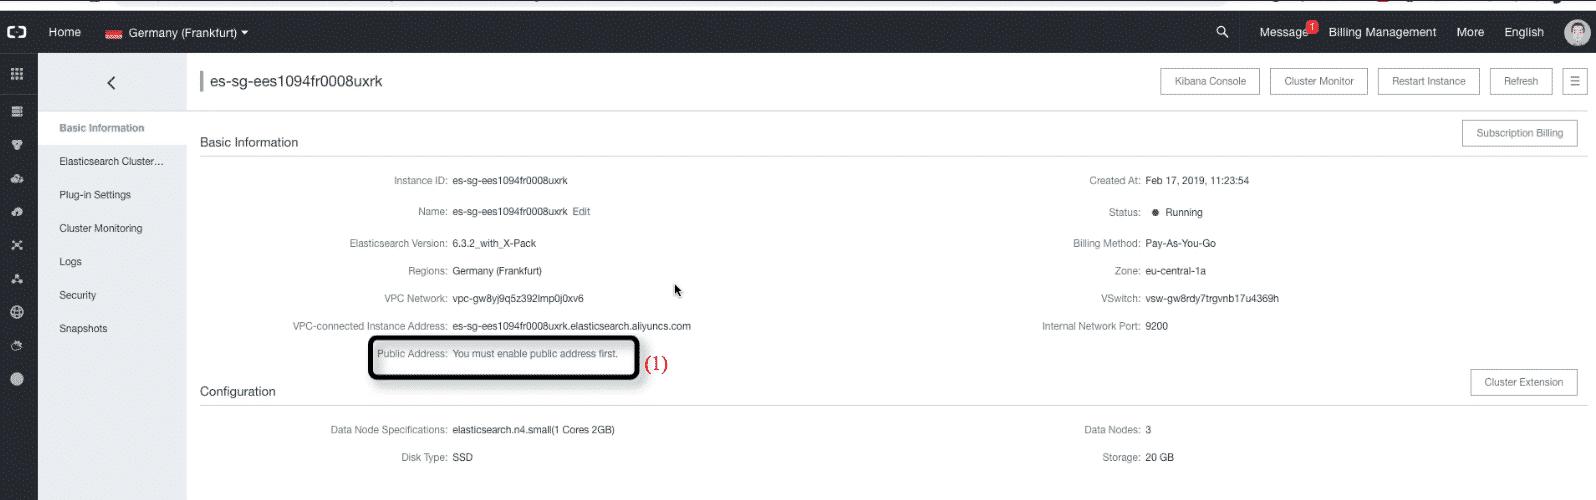 Alibaba Cloud Elasticsearch: edit cluster settings